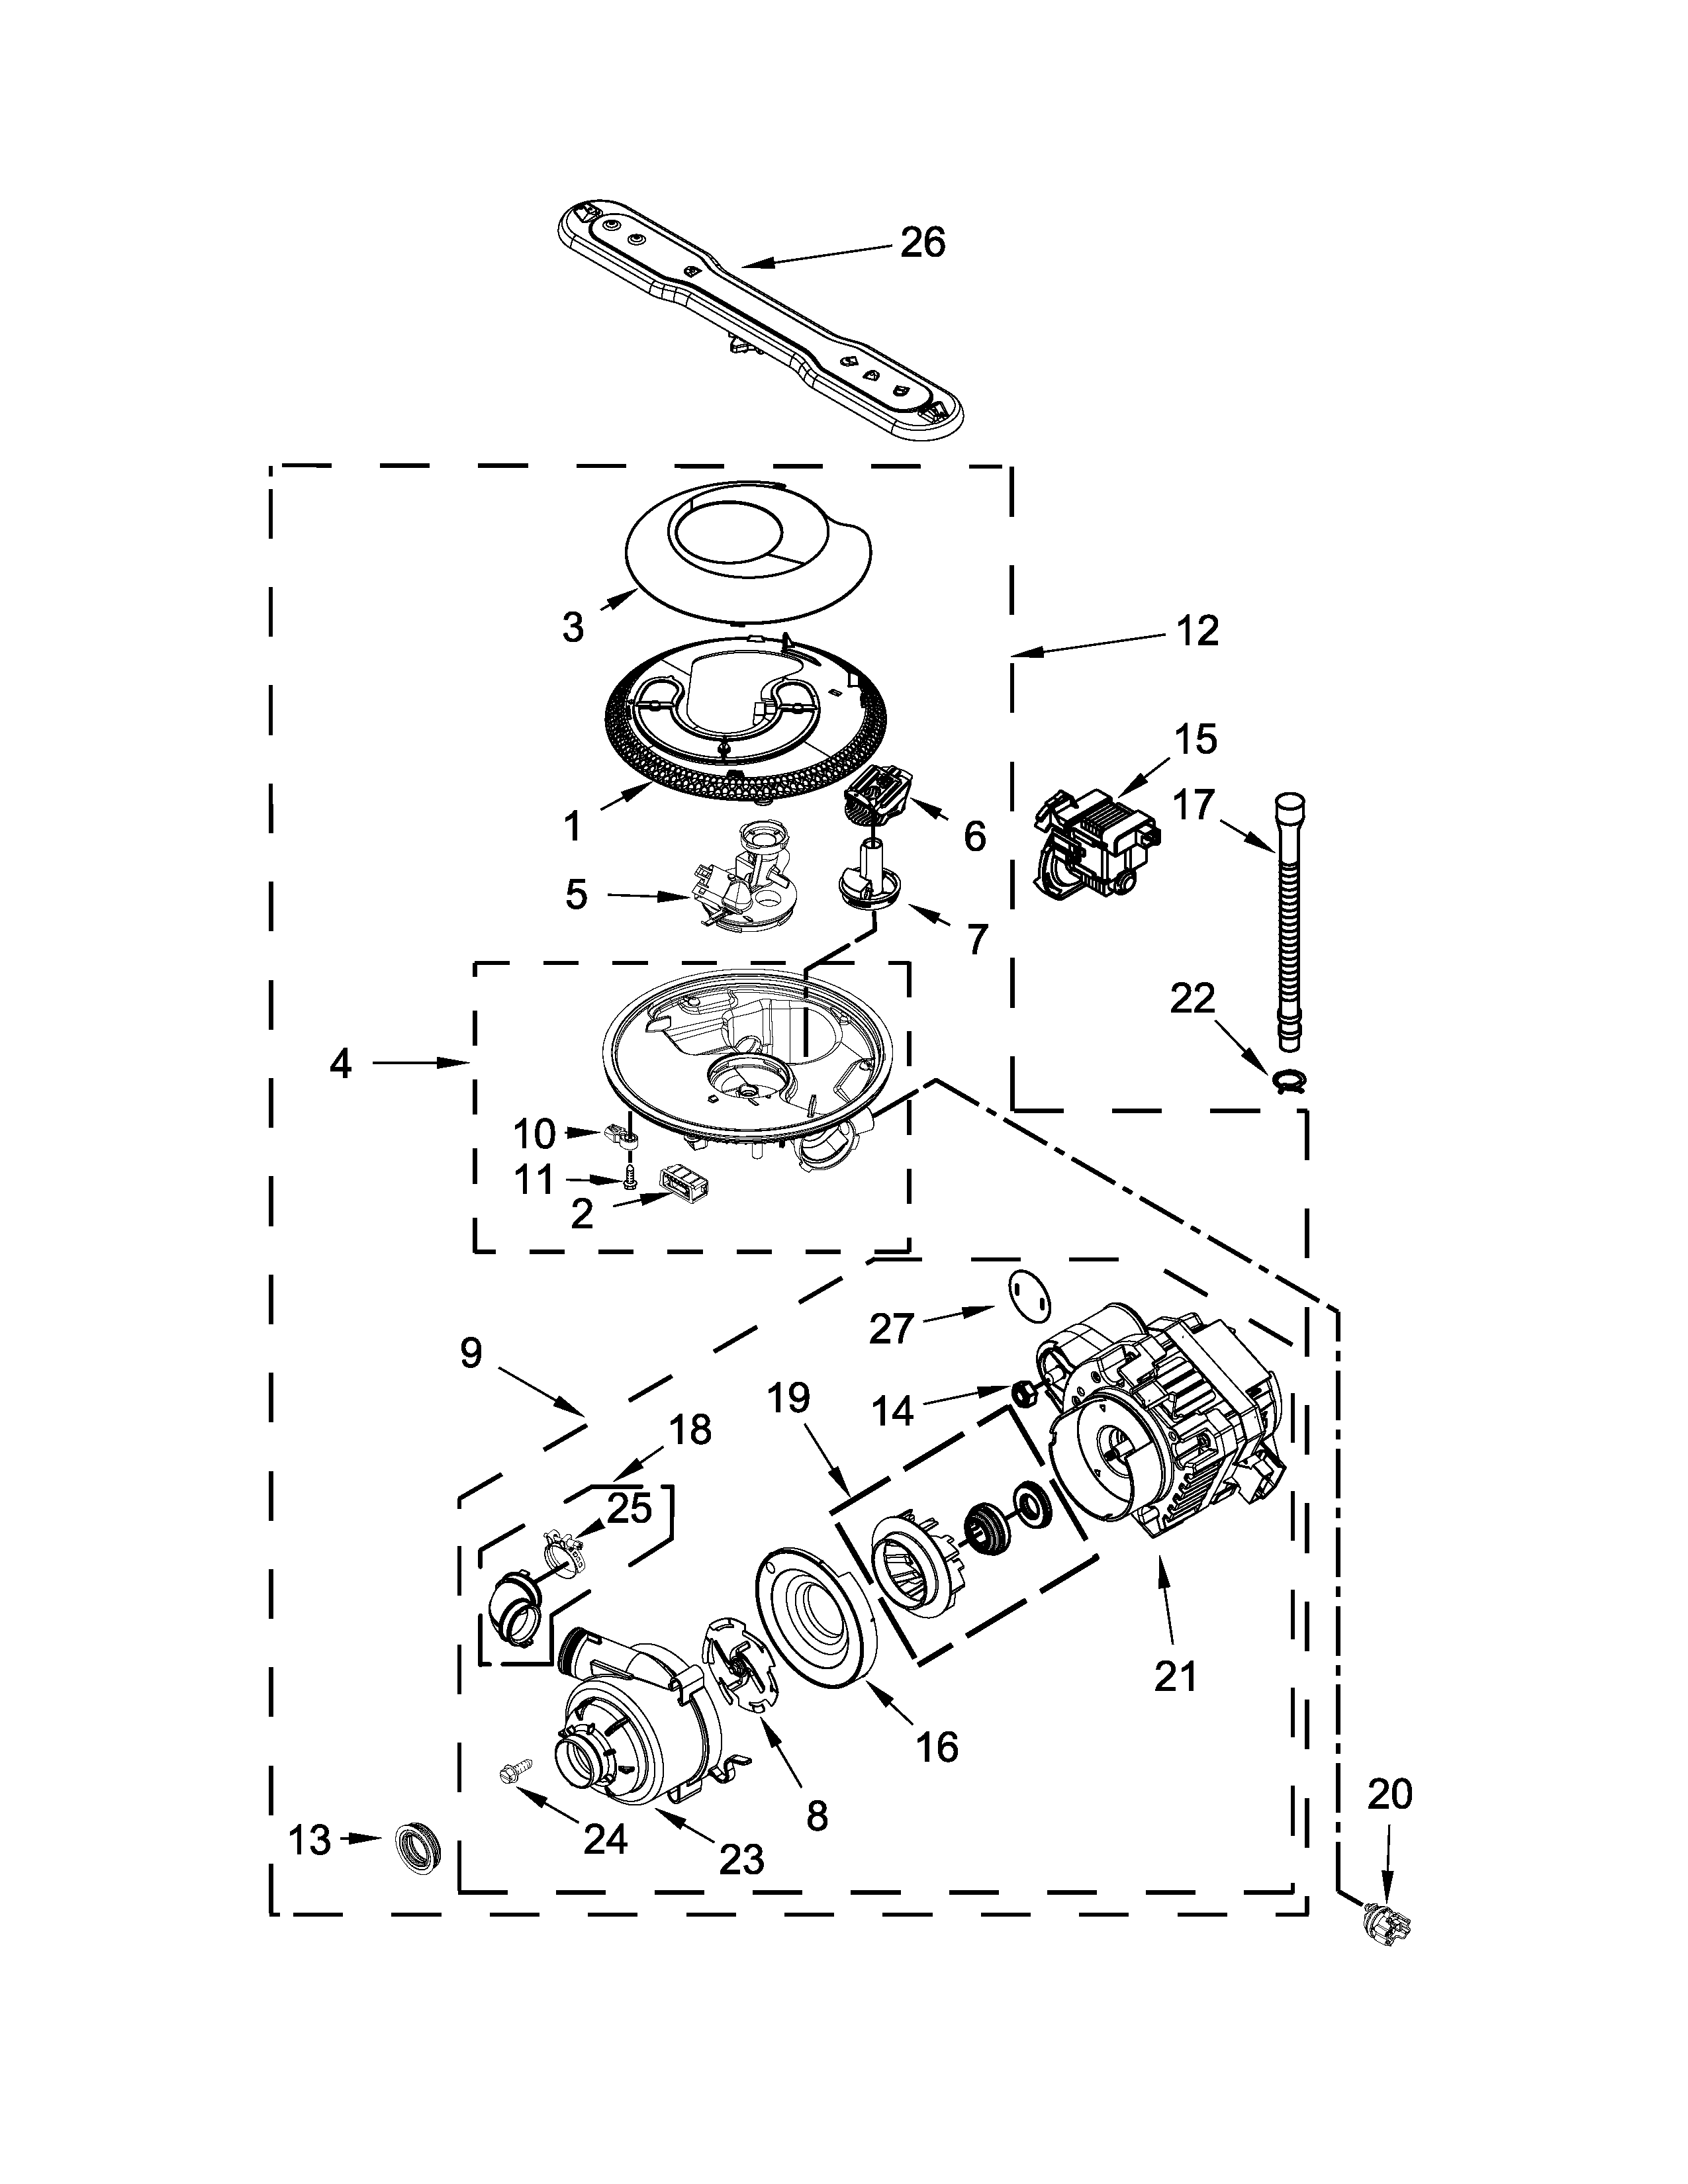 medium resolution of image result for diagrams for maytag dishwasher mdb4949sdm2 manual